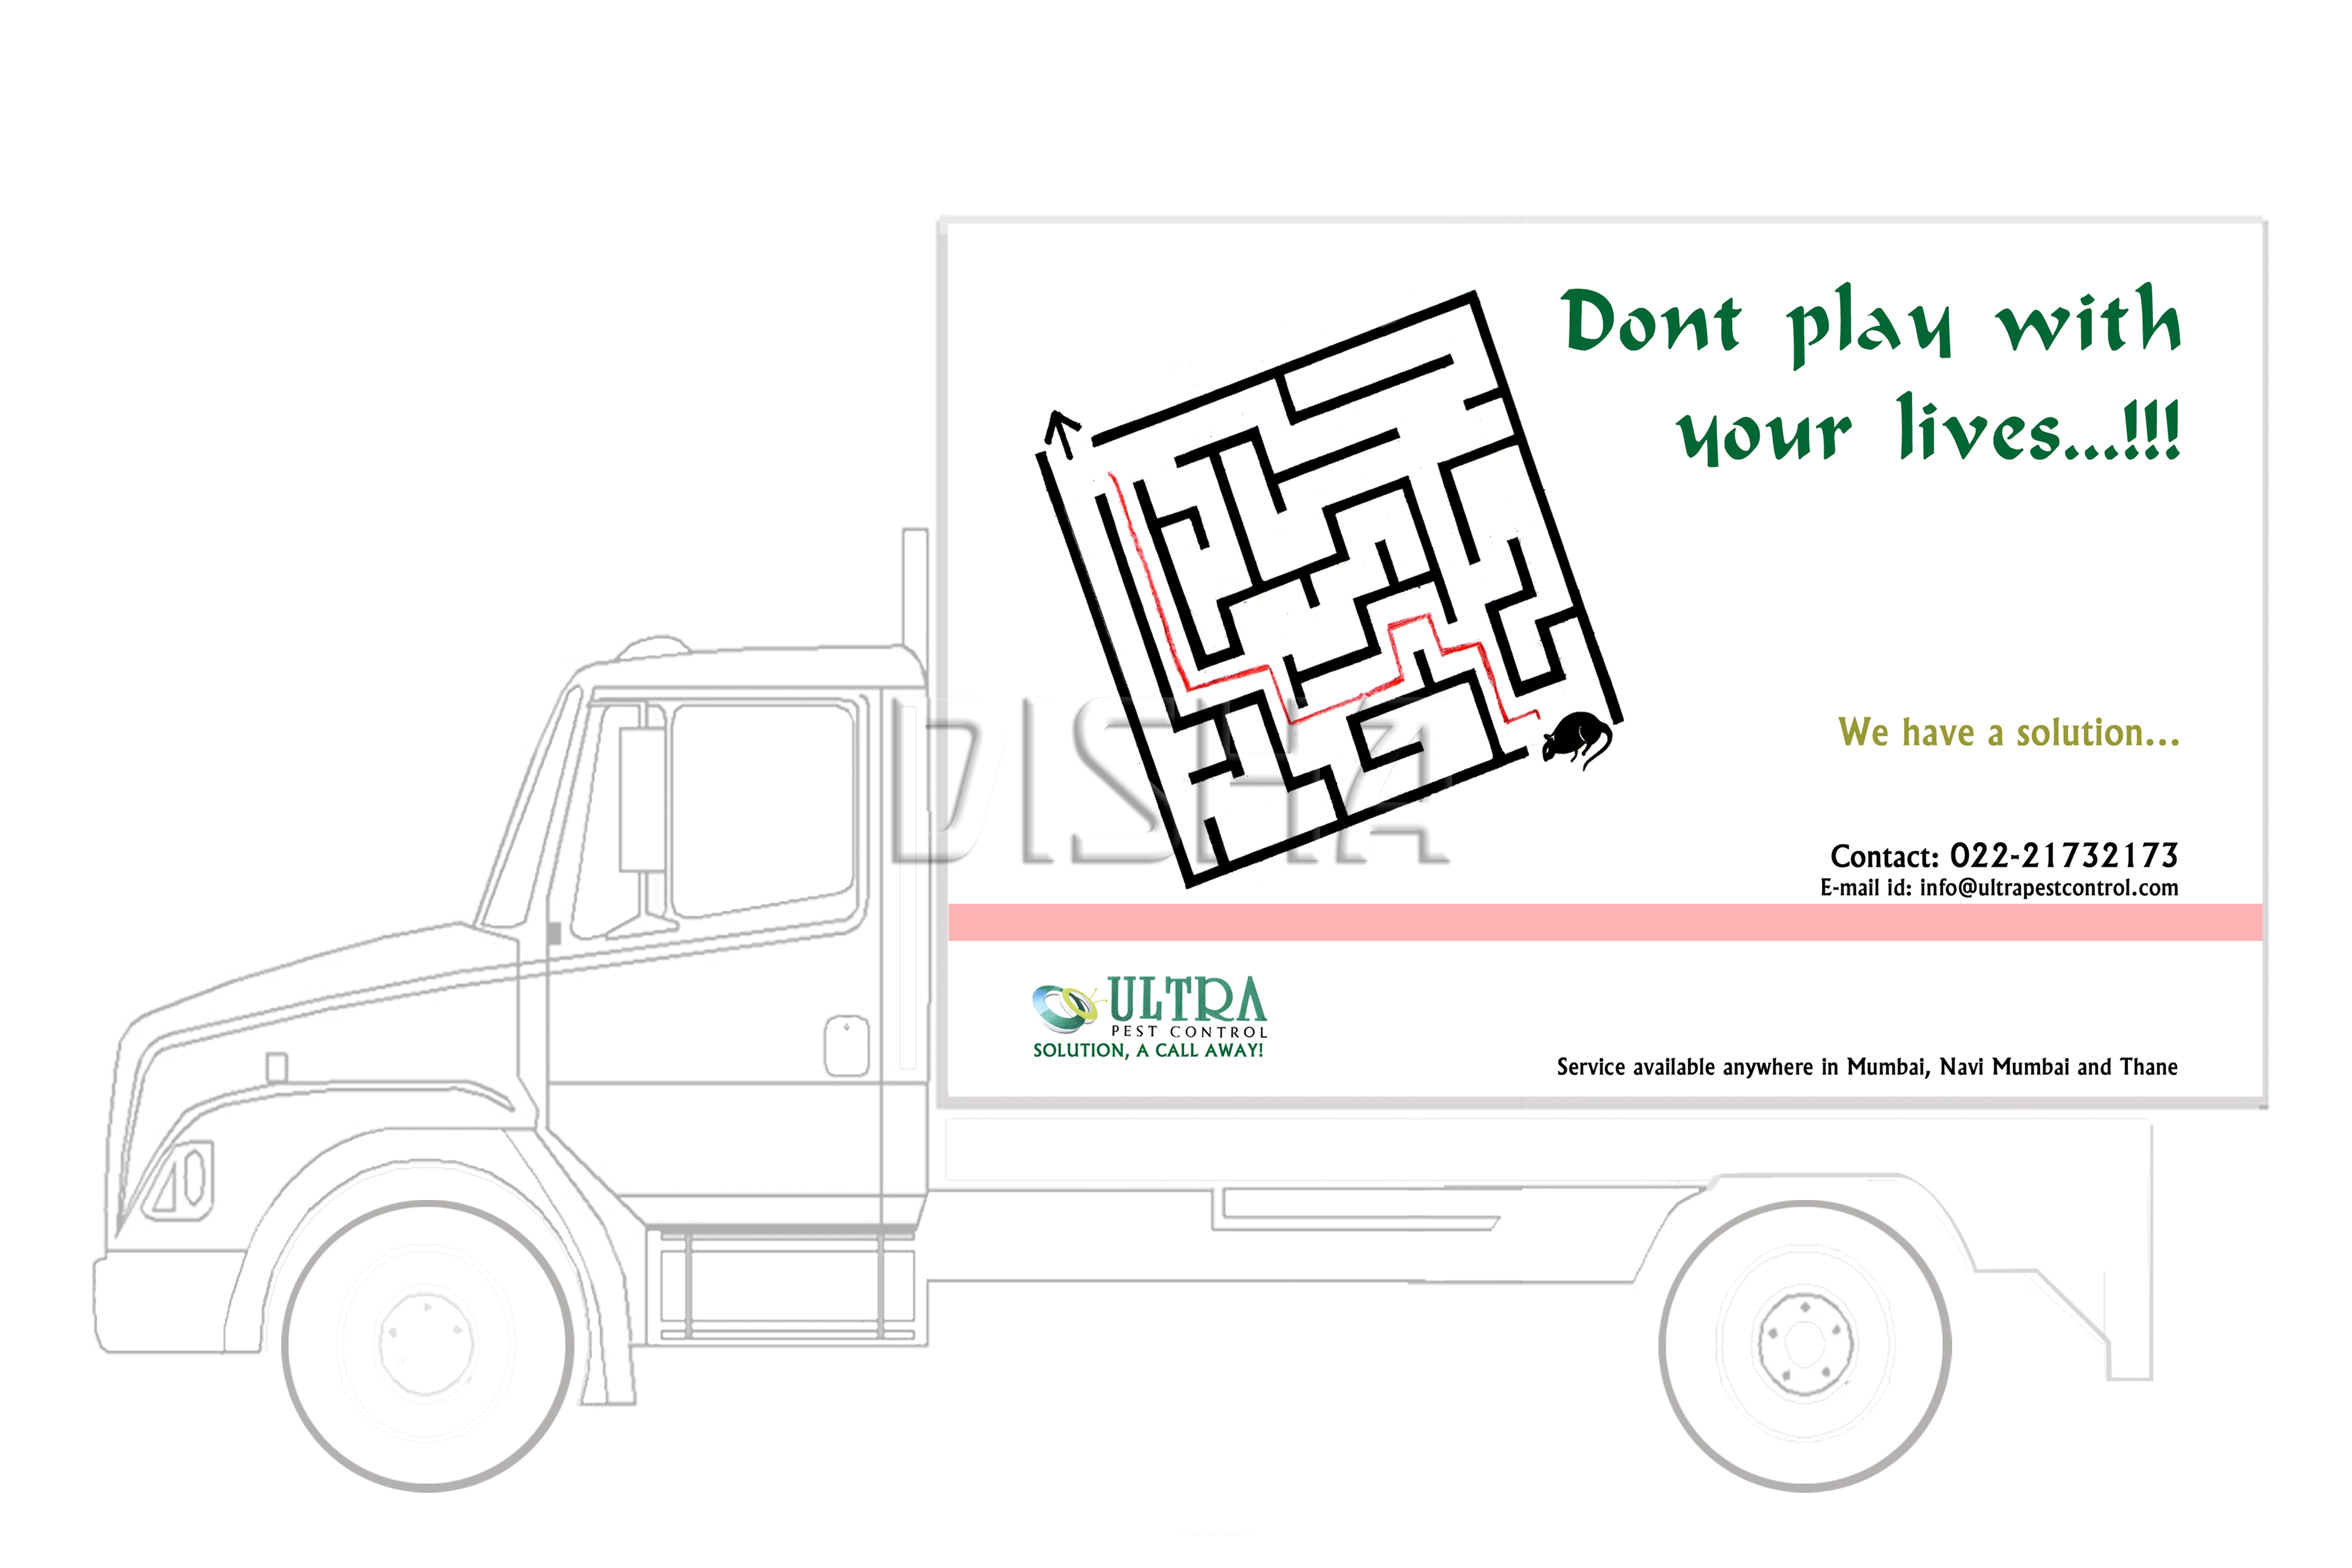 Ultra pest control campaign by disha haria at Coroflot.com